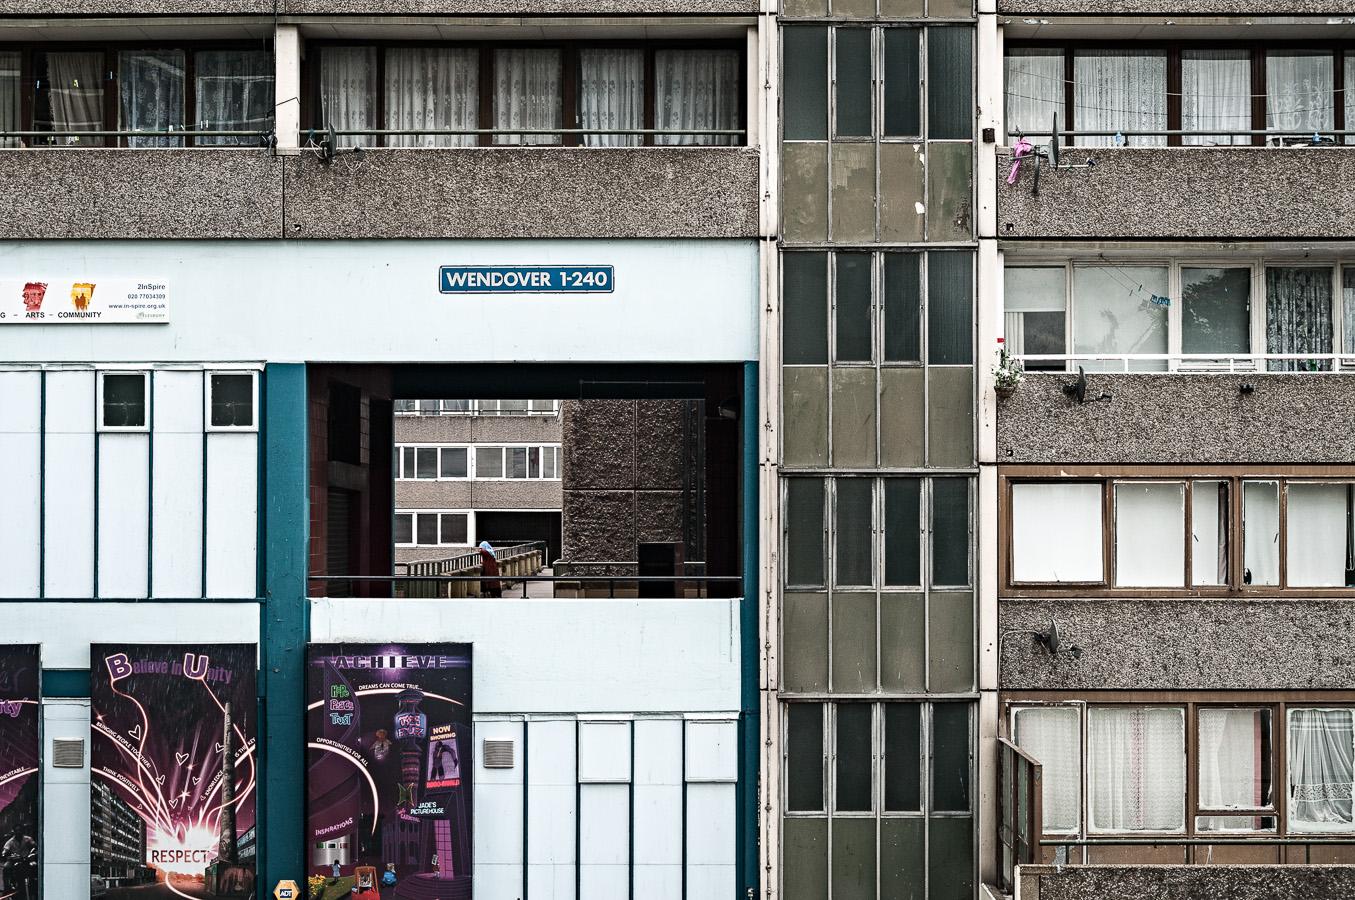 240-wendover-estate-london.jpg